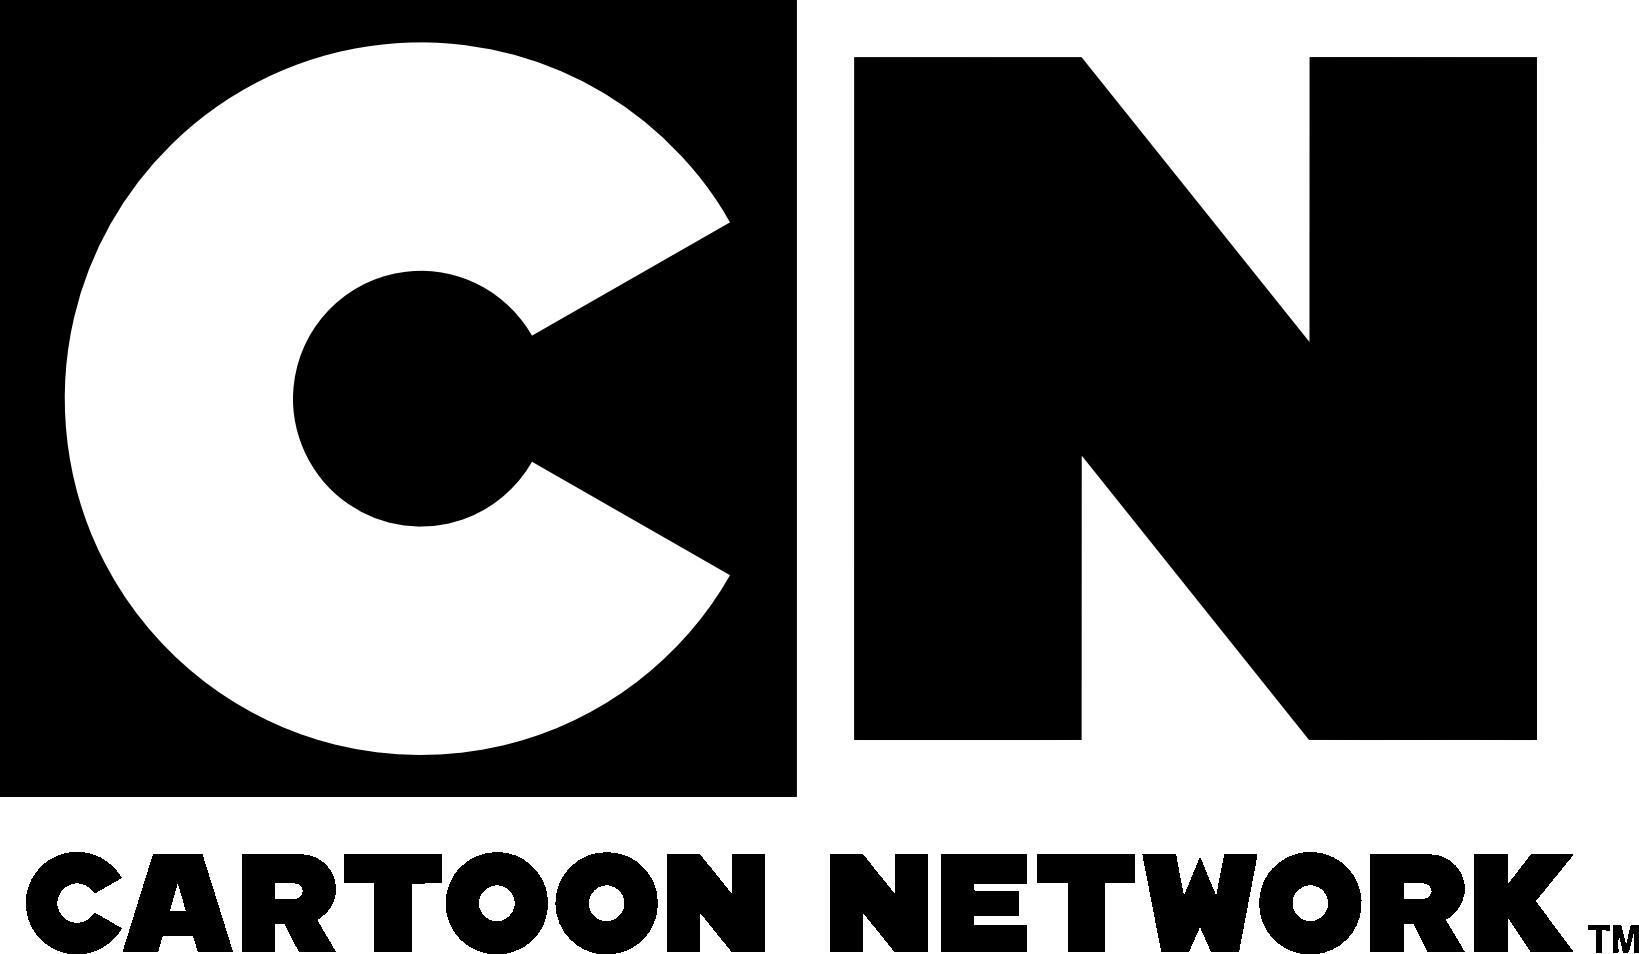 Cartoon Networks